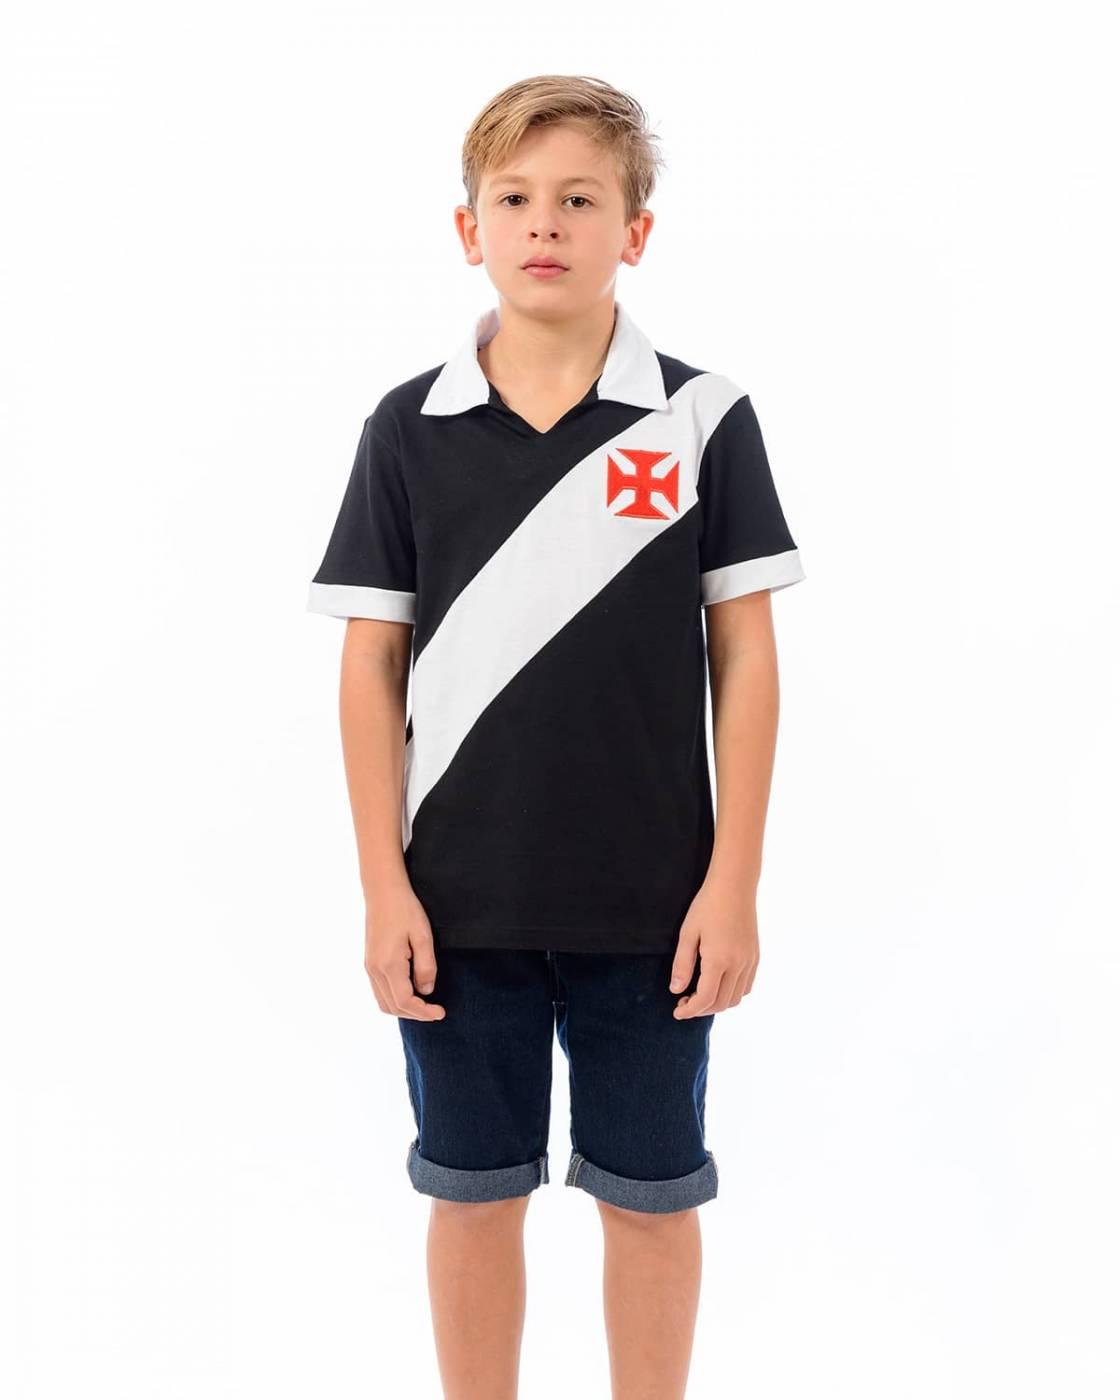 Camisa polo Vasco infantil Paris - preto